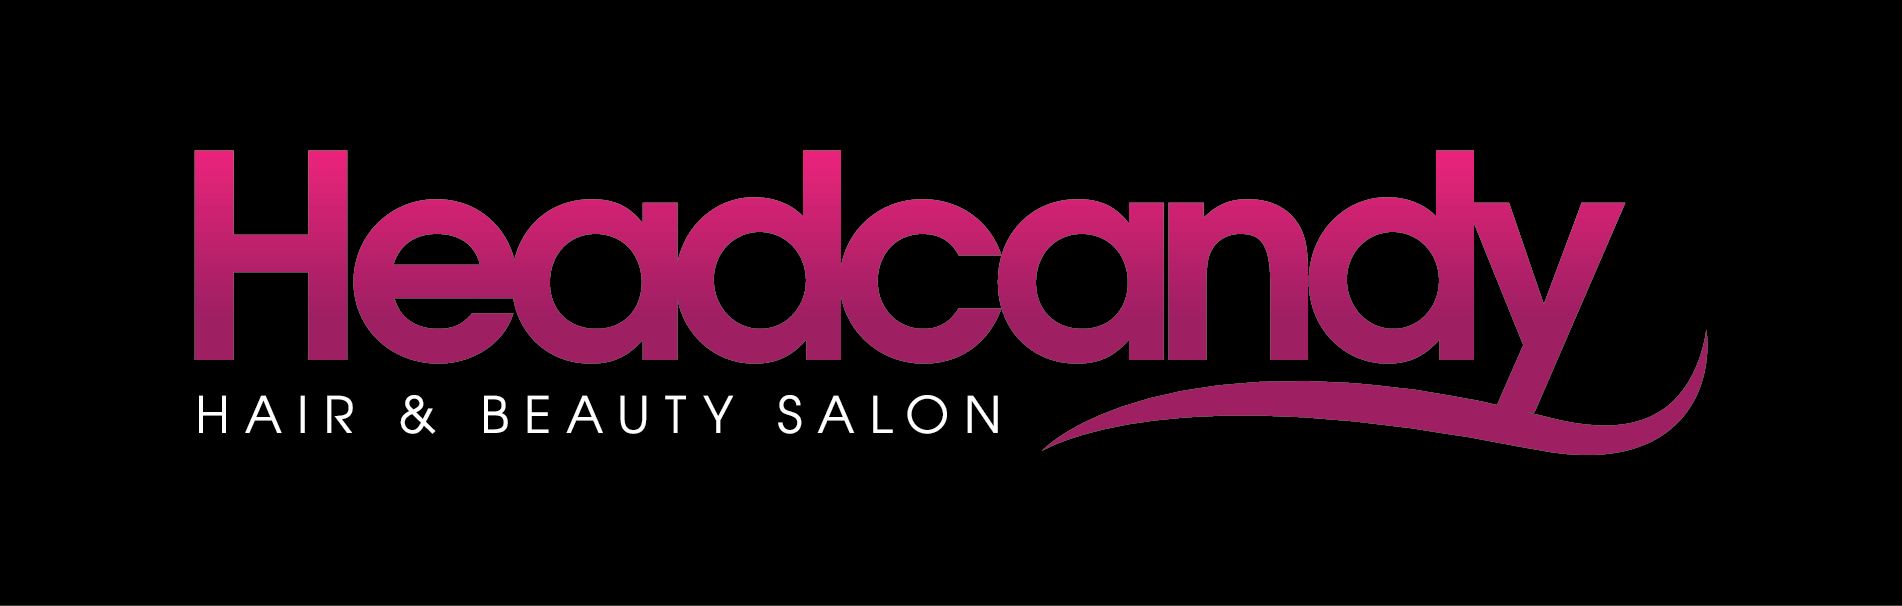 Headcandy Salon Logo and Images